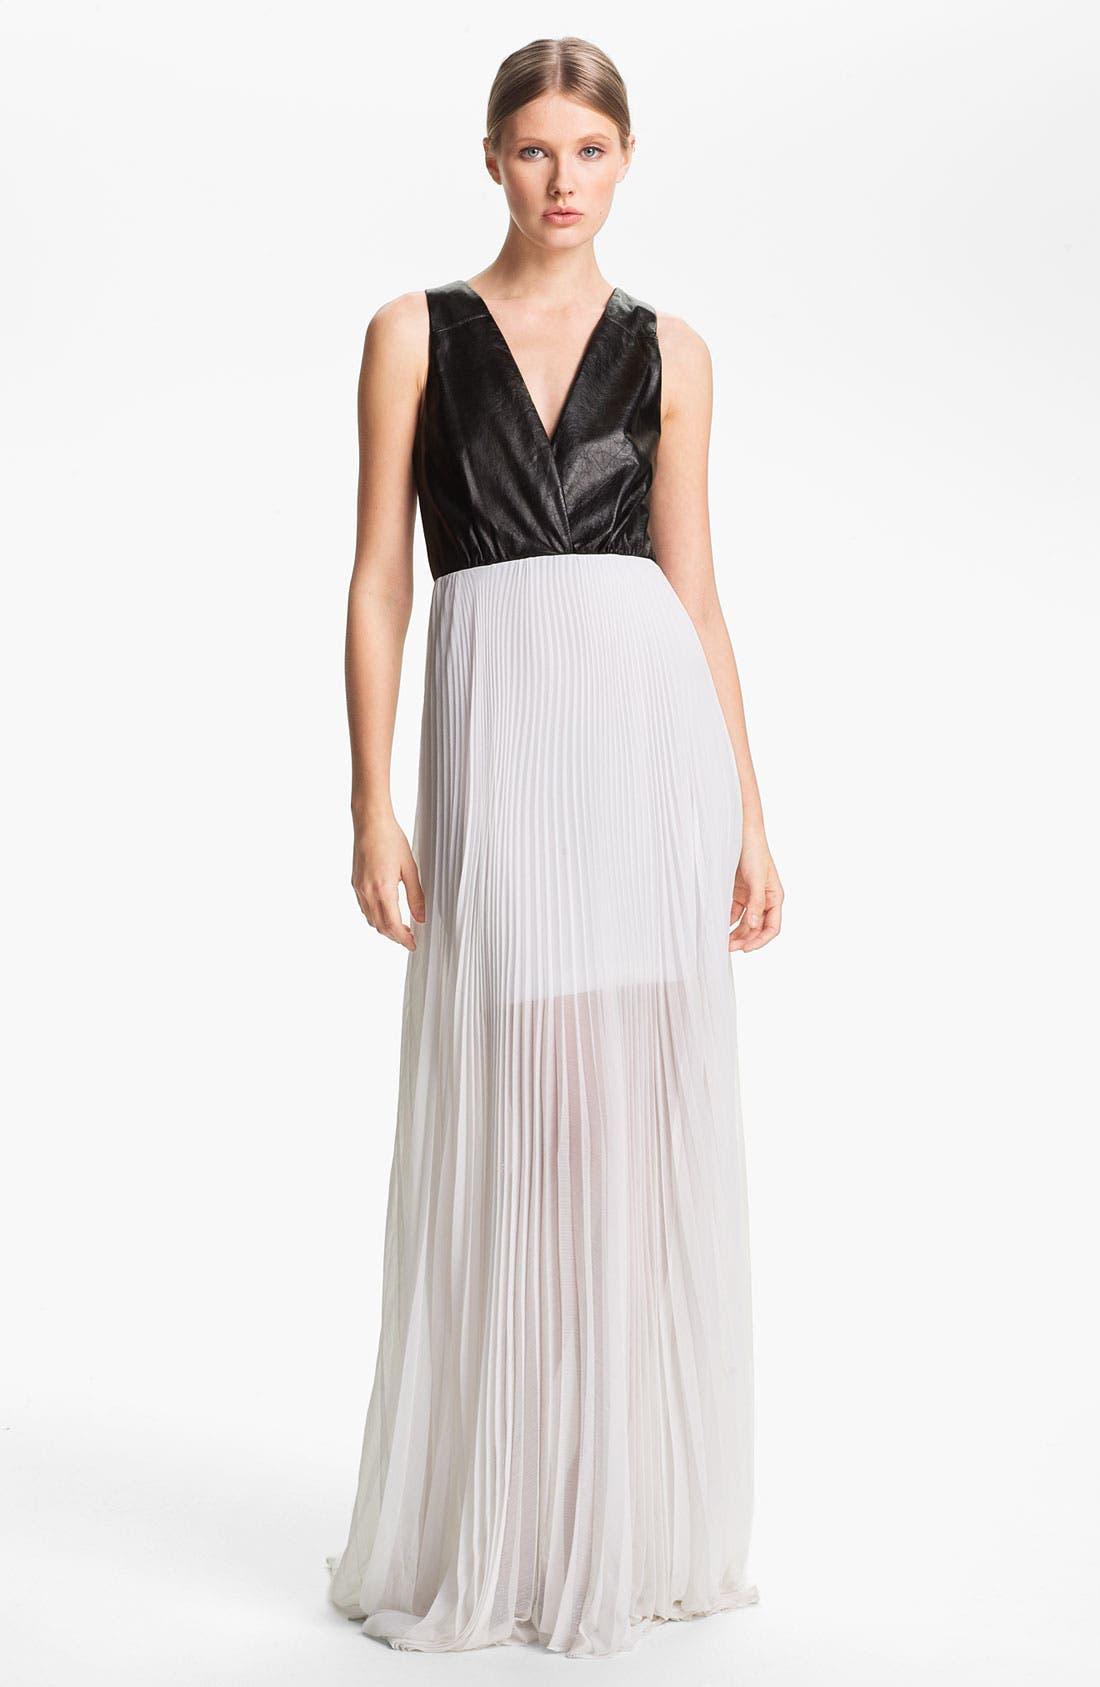 ALICE + OLIVIA Leather Bodice & Chiffon Dress, Main, color, 009